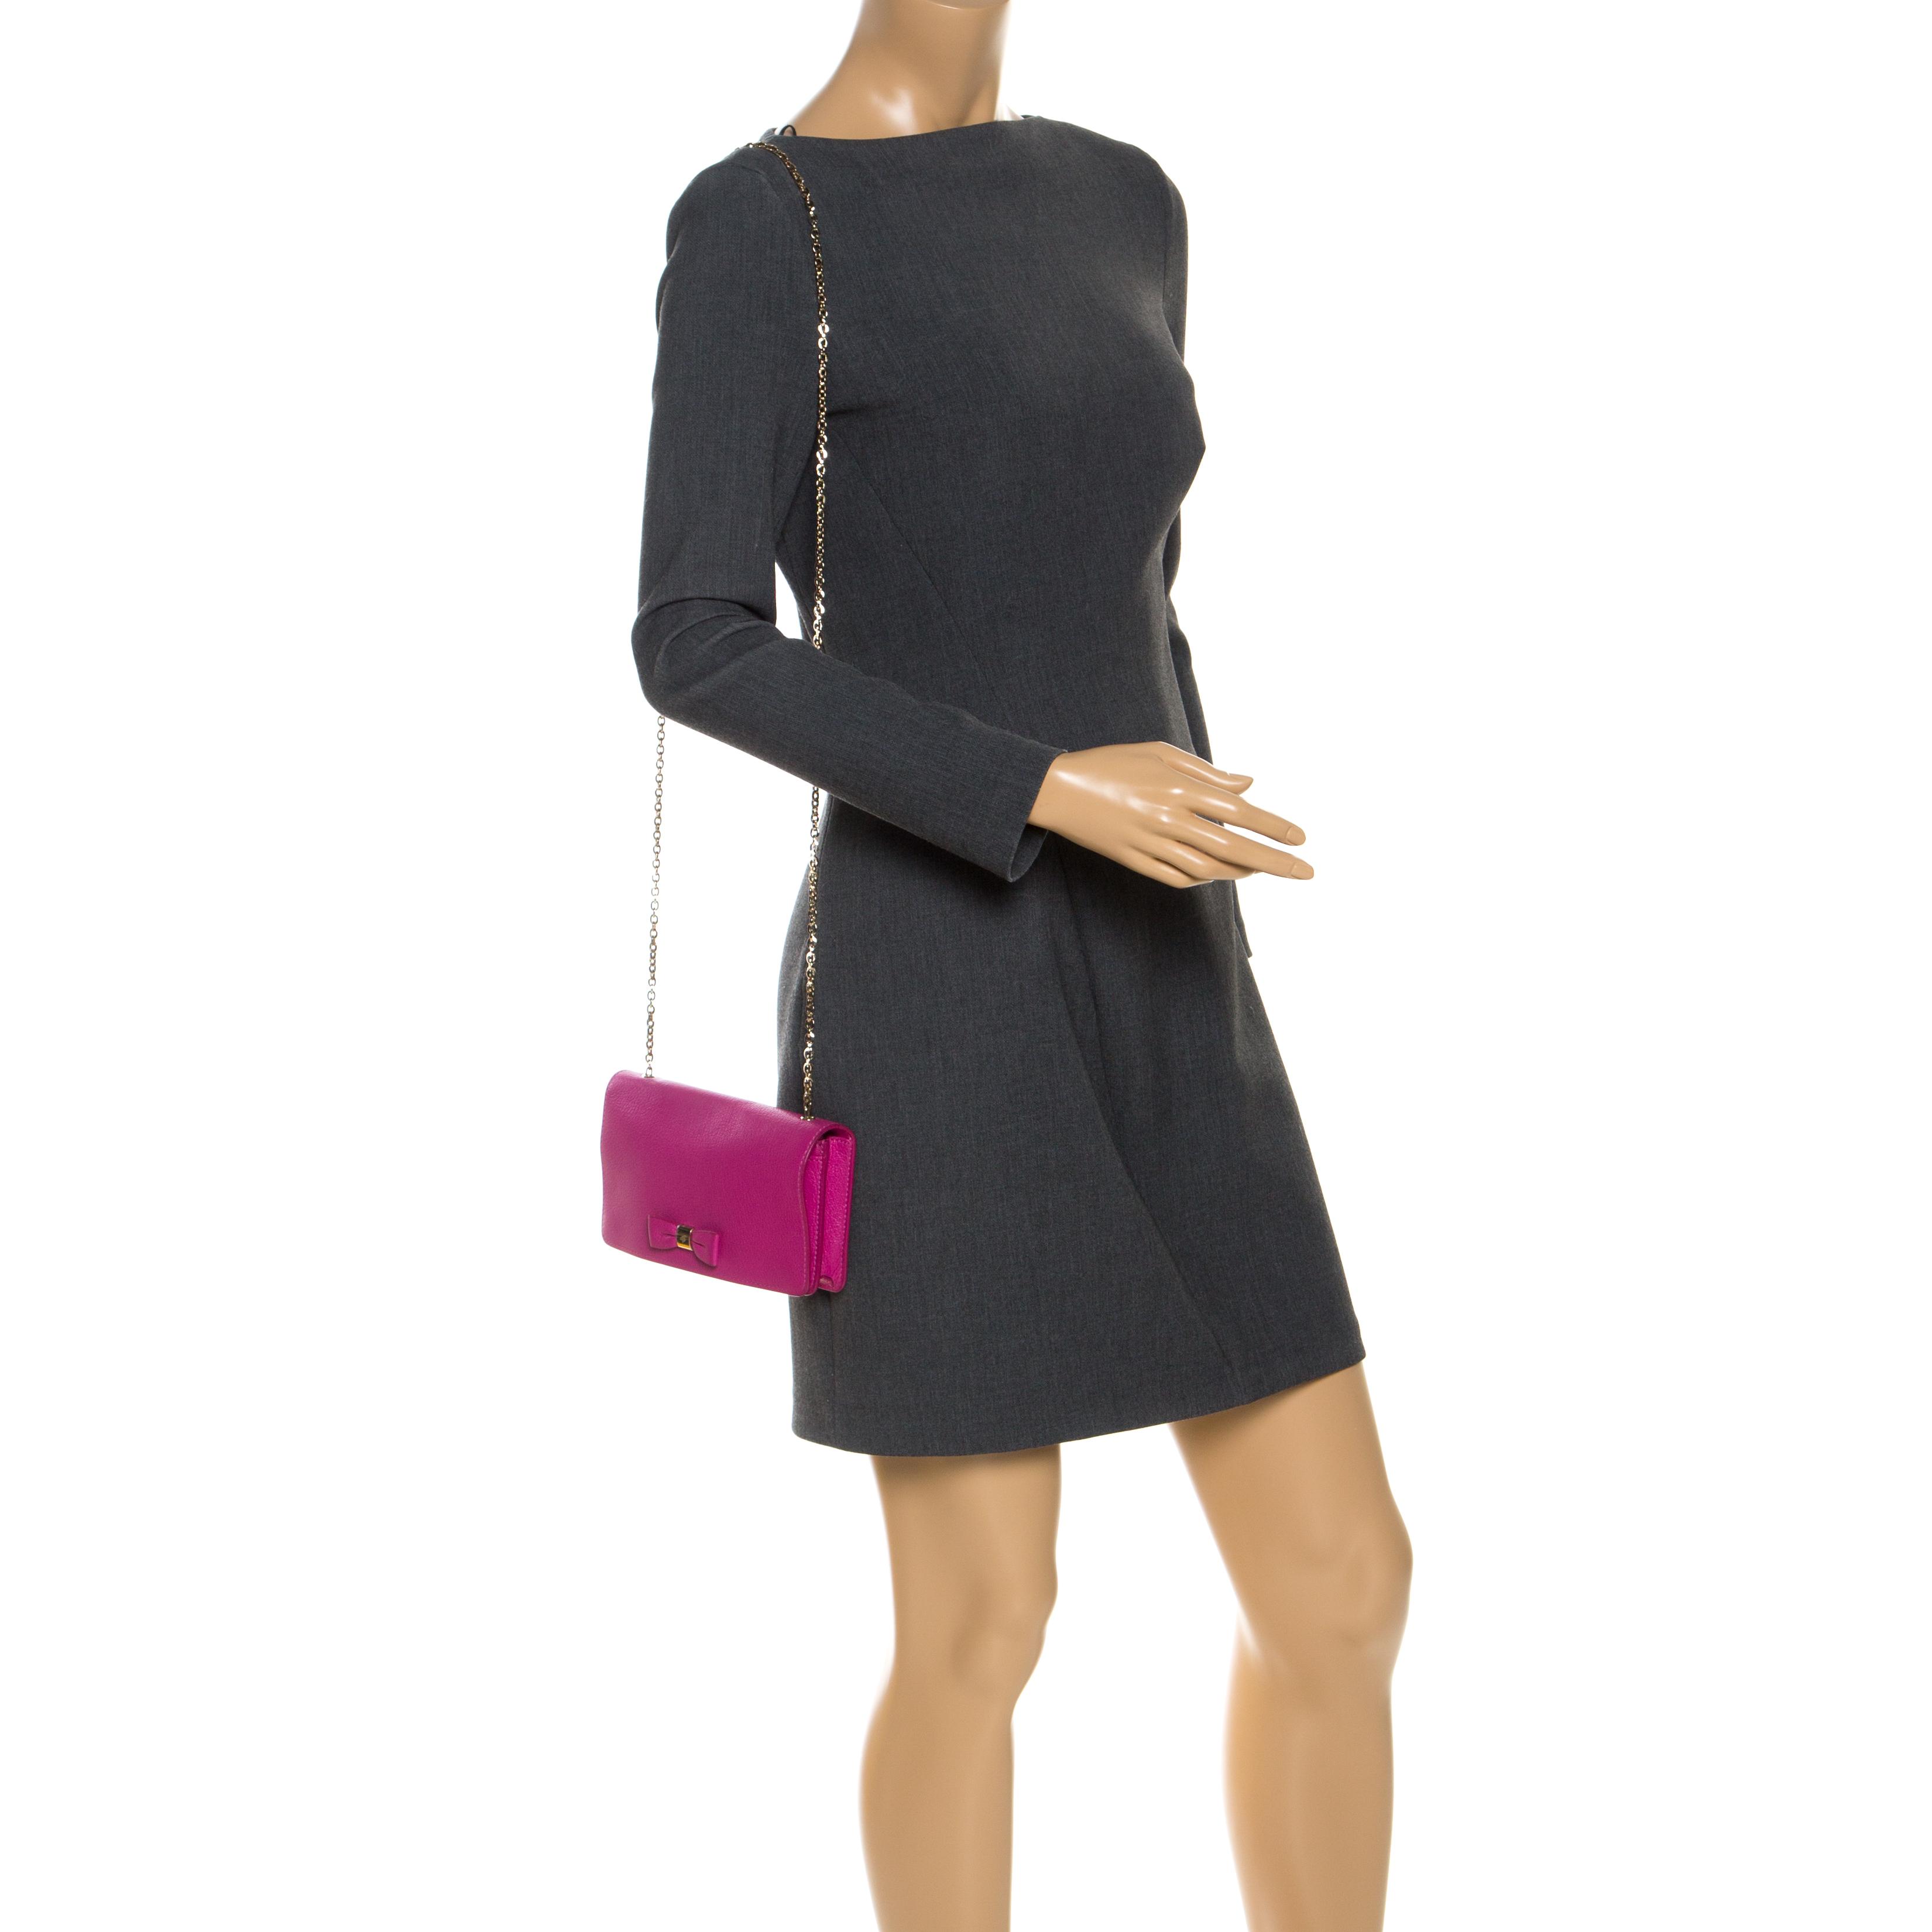 Mulberry Fuschia Leather Crossbody Bag, Pink